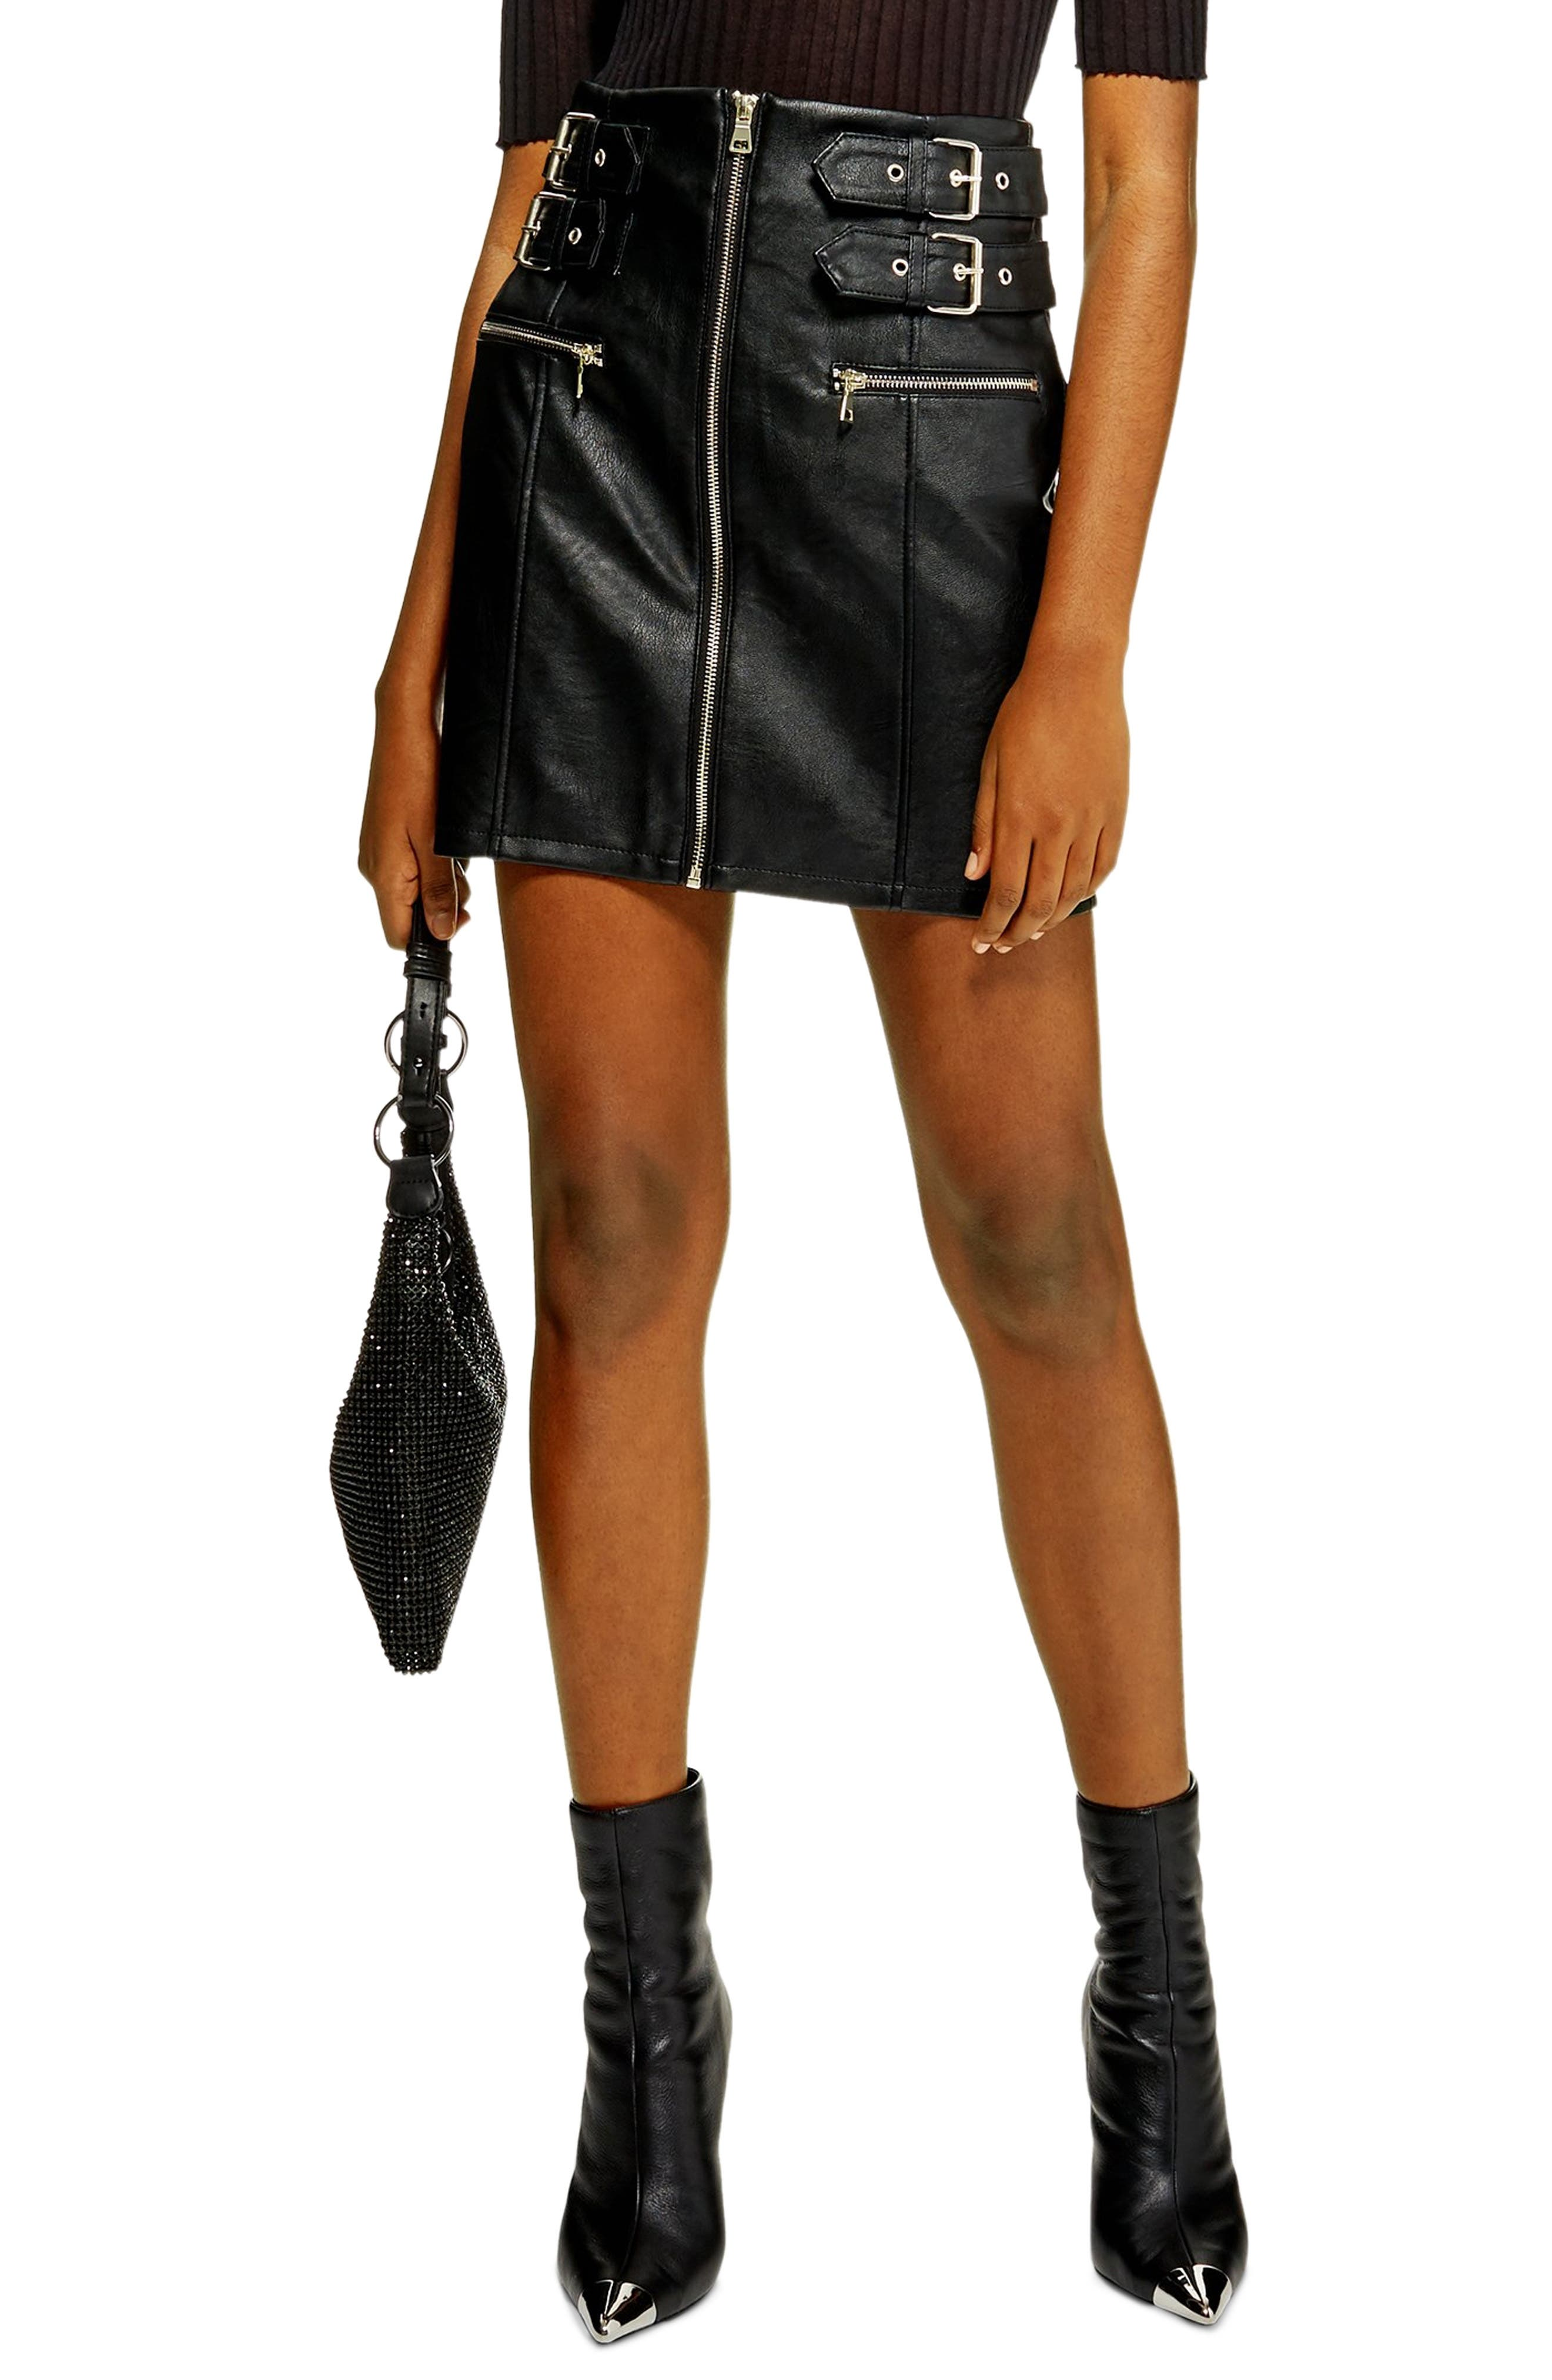 Topshop Faux Leather Zip Miniskirt, US (fits like 6-8) - Black